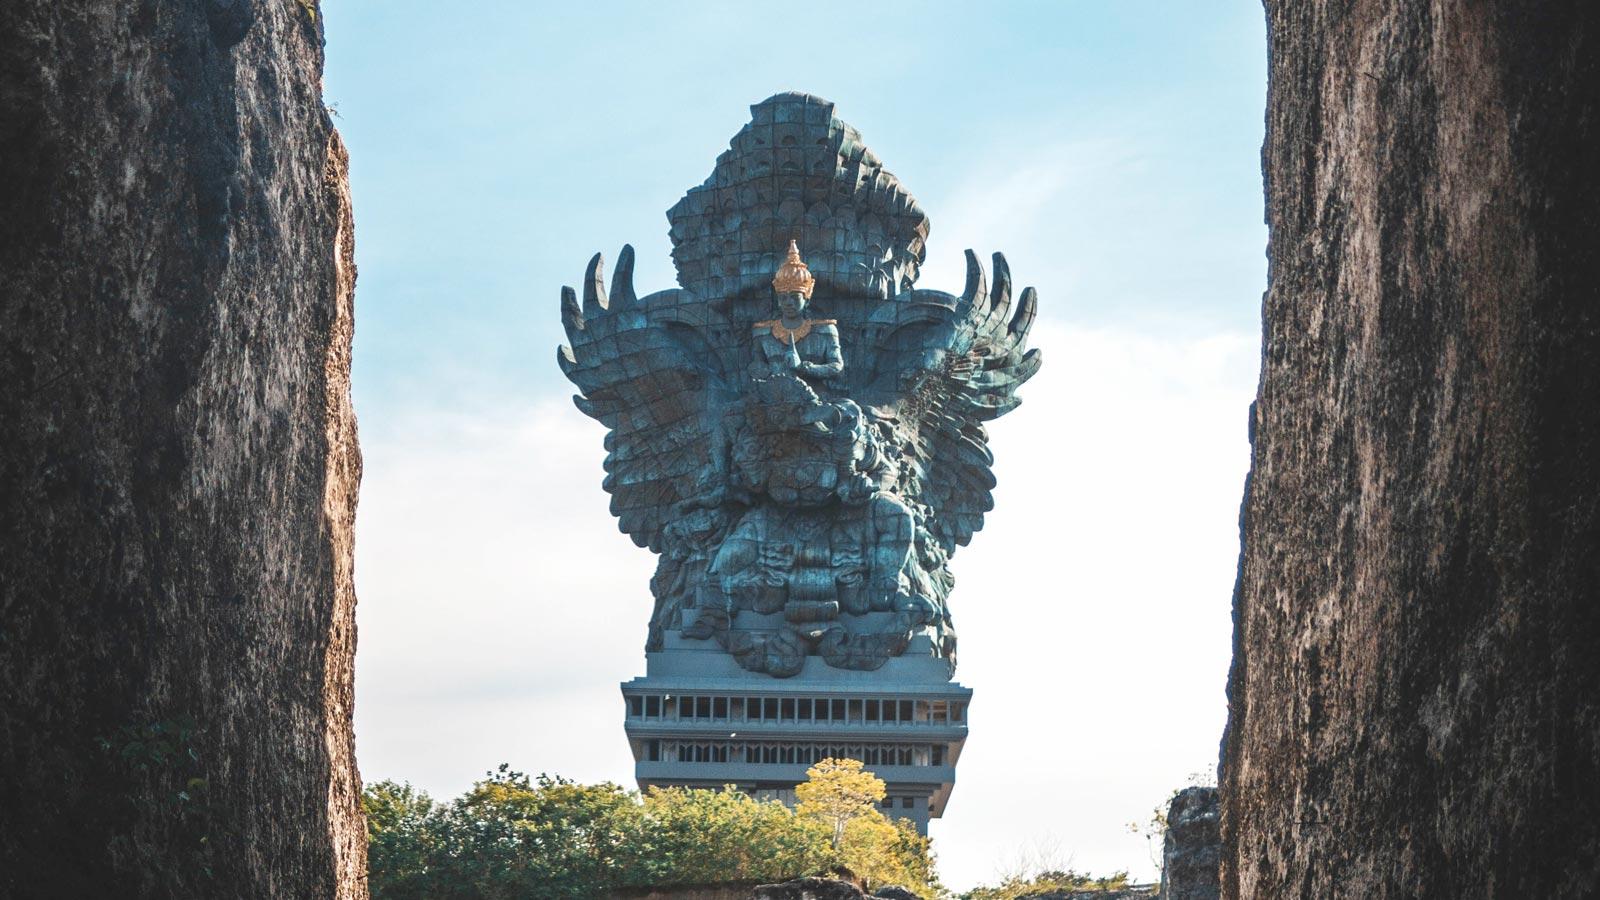 The Garuda Wisnu Kencana (GWK) statue